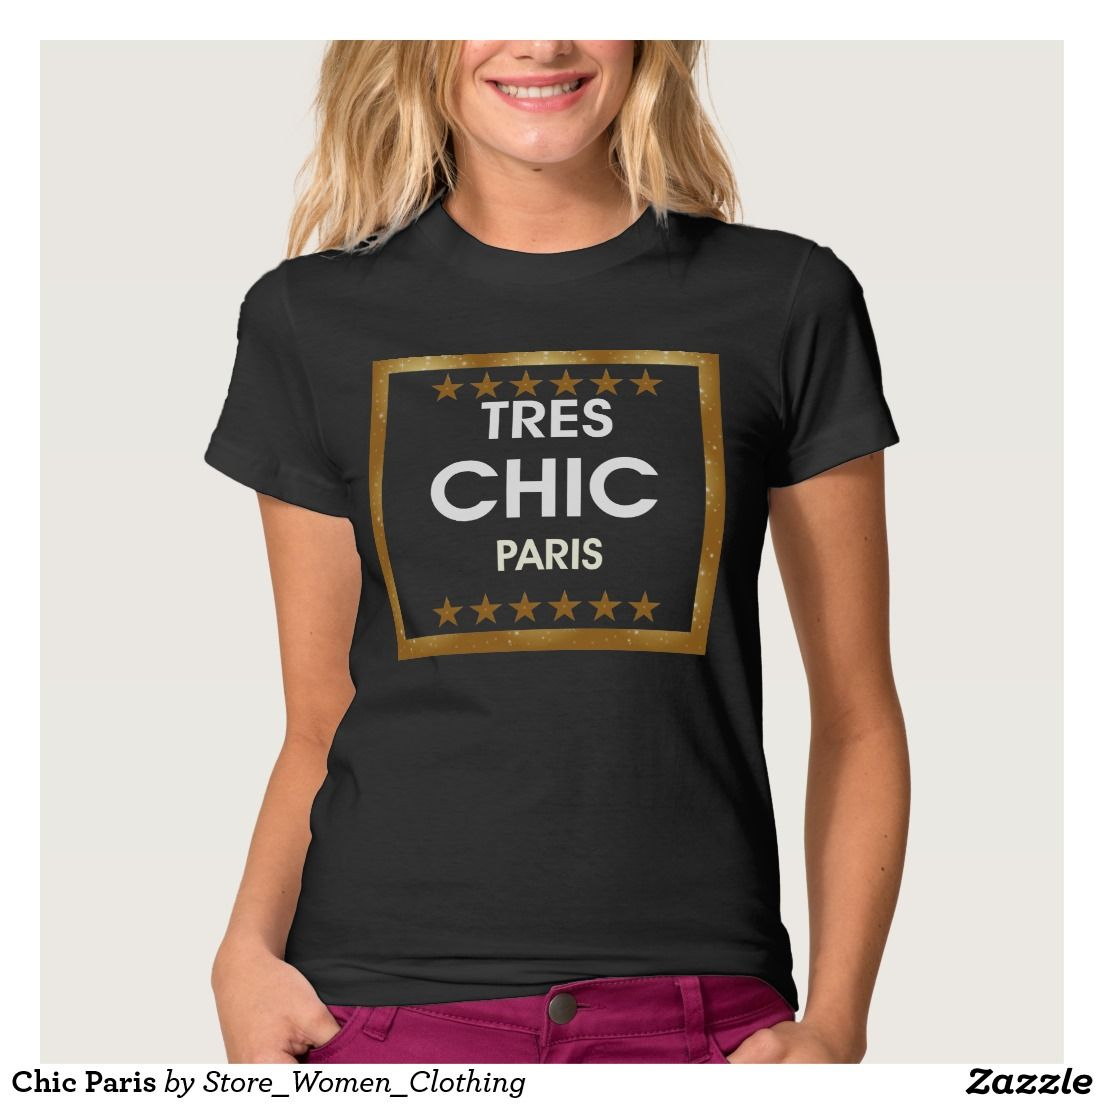 #Chic #Paris #T-shirt